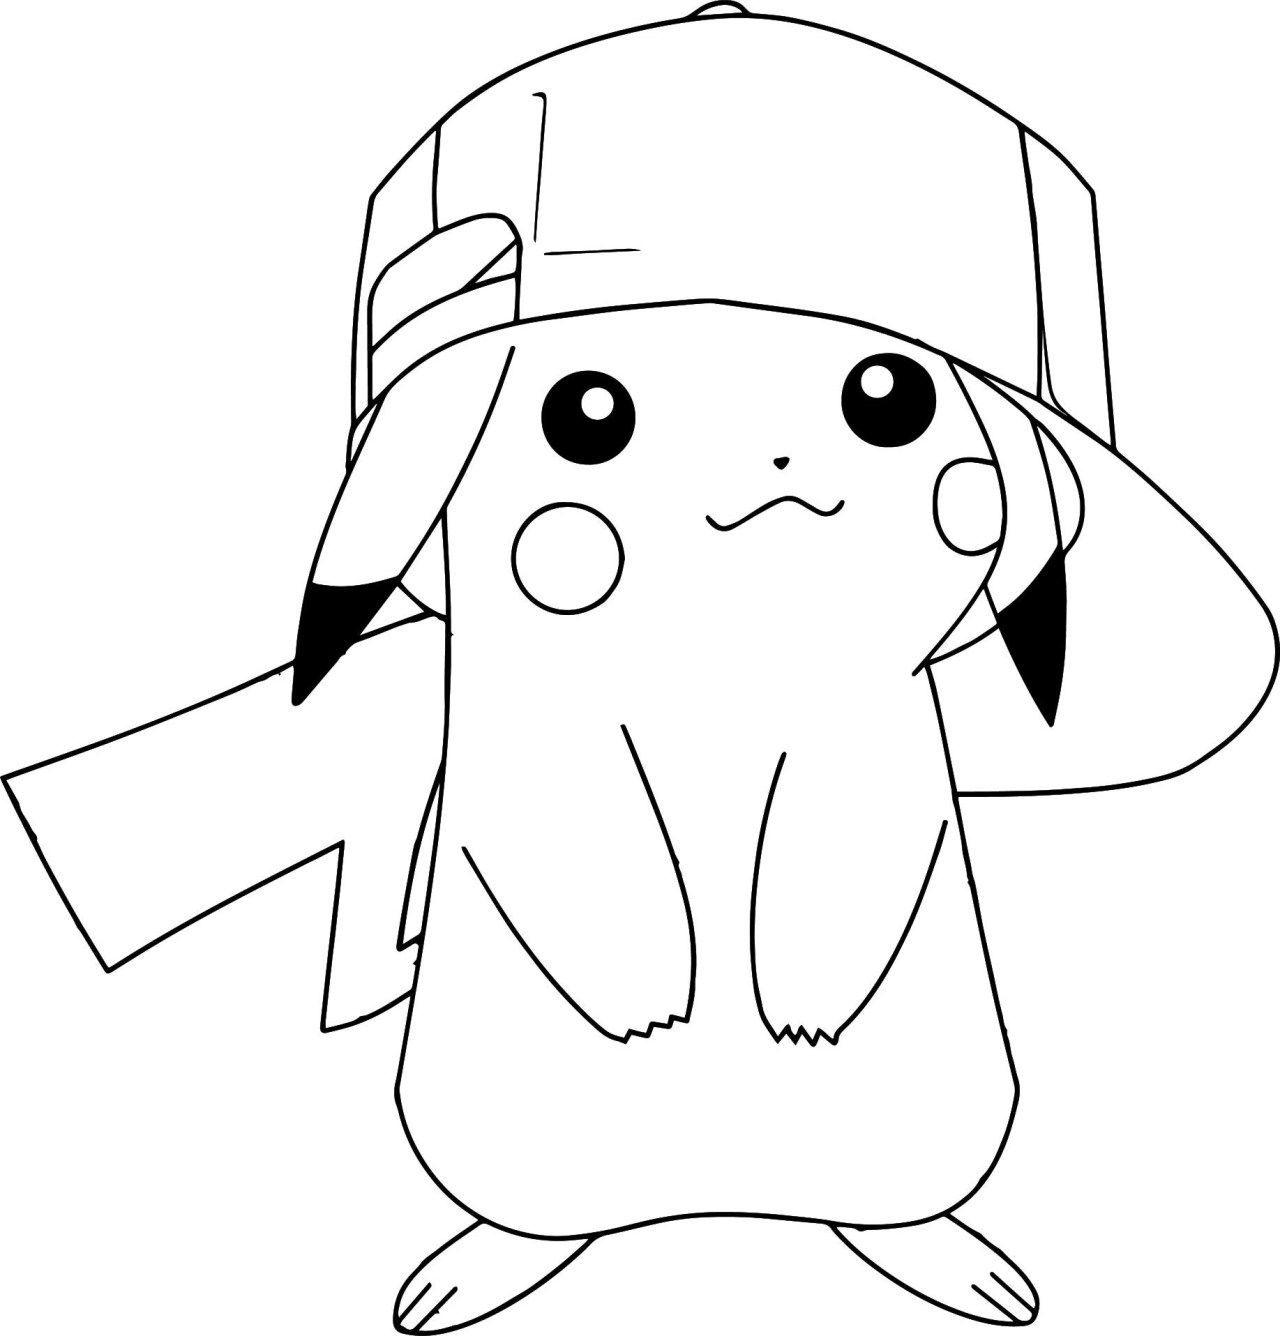 Free Printable Pokemon Coloring Pages Pokemon Coloring Pages Printable Free Printable Pokemon Coloring Entitlementtrap Com Pikachu Coloring Page Cartoon Coloring Pages Pokemon Coloring Sheets